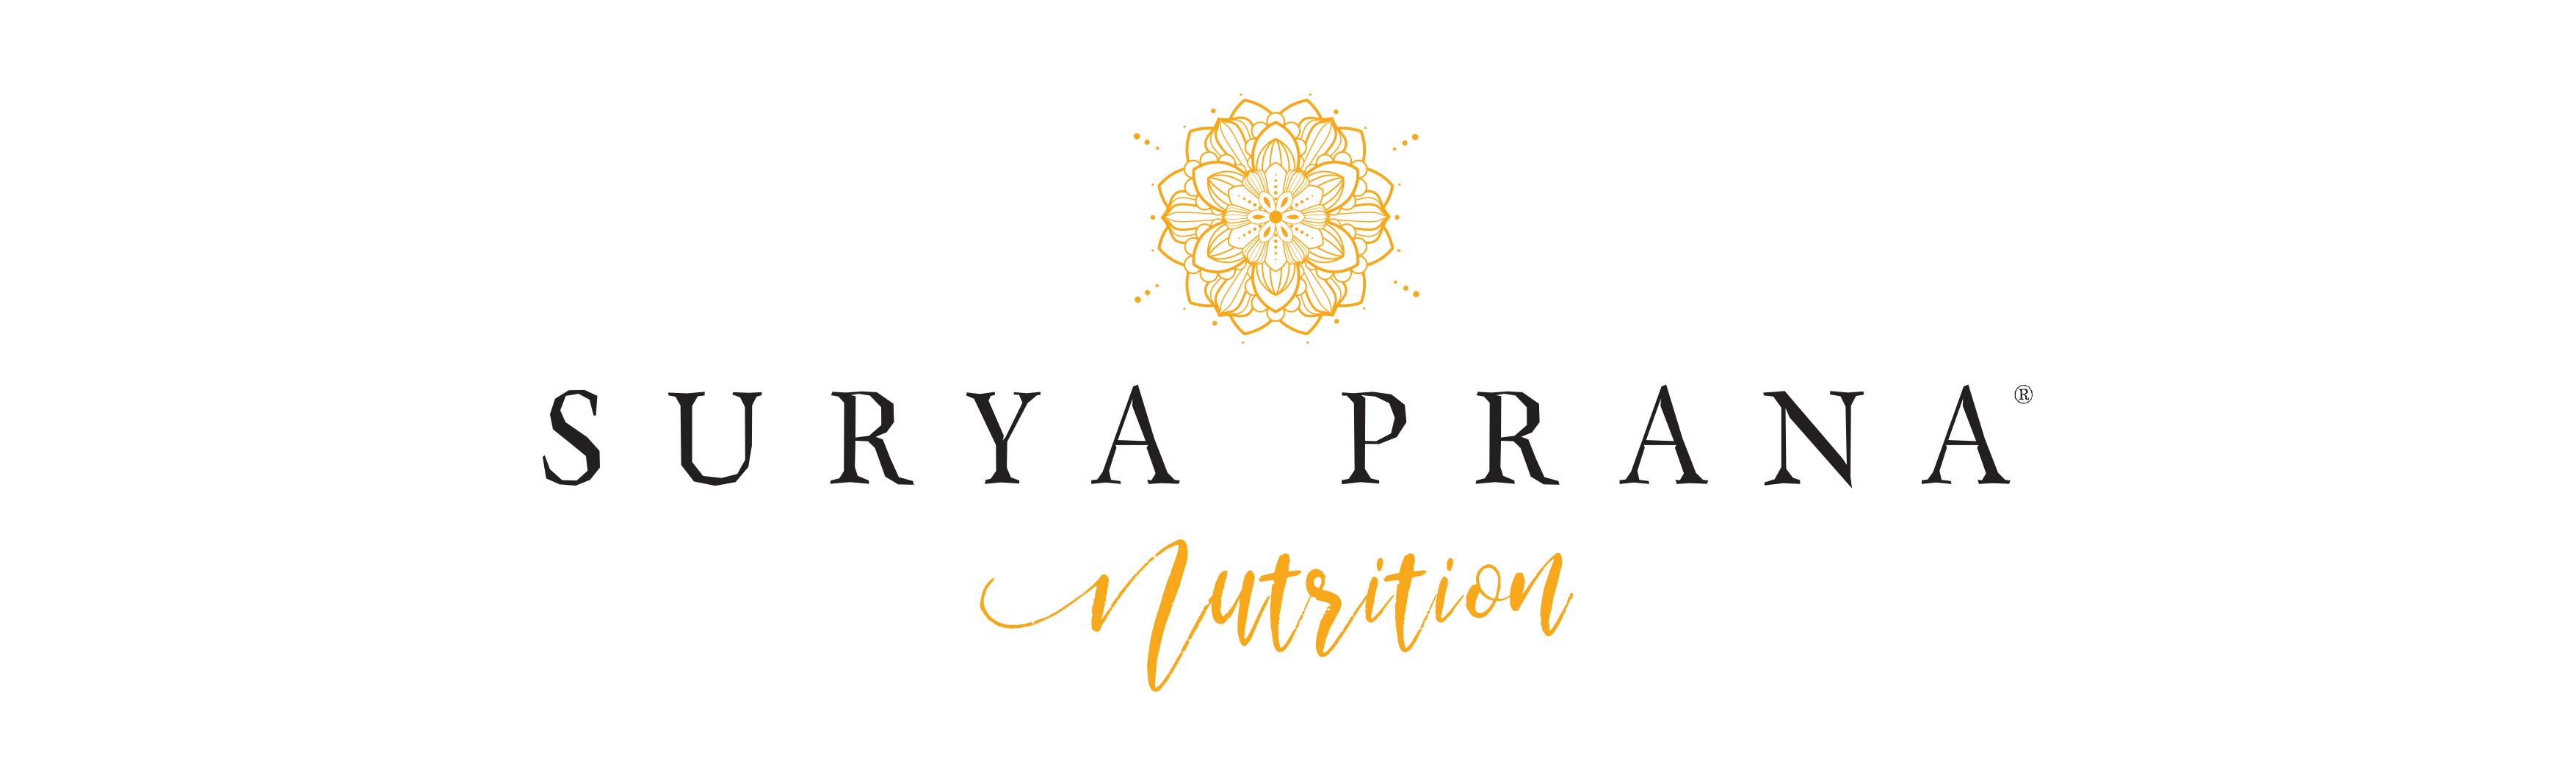 Surya Prana Nutrition Logo